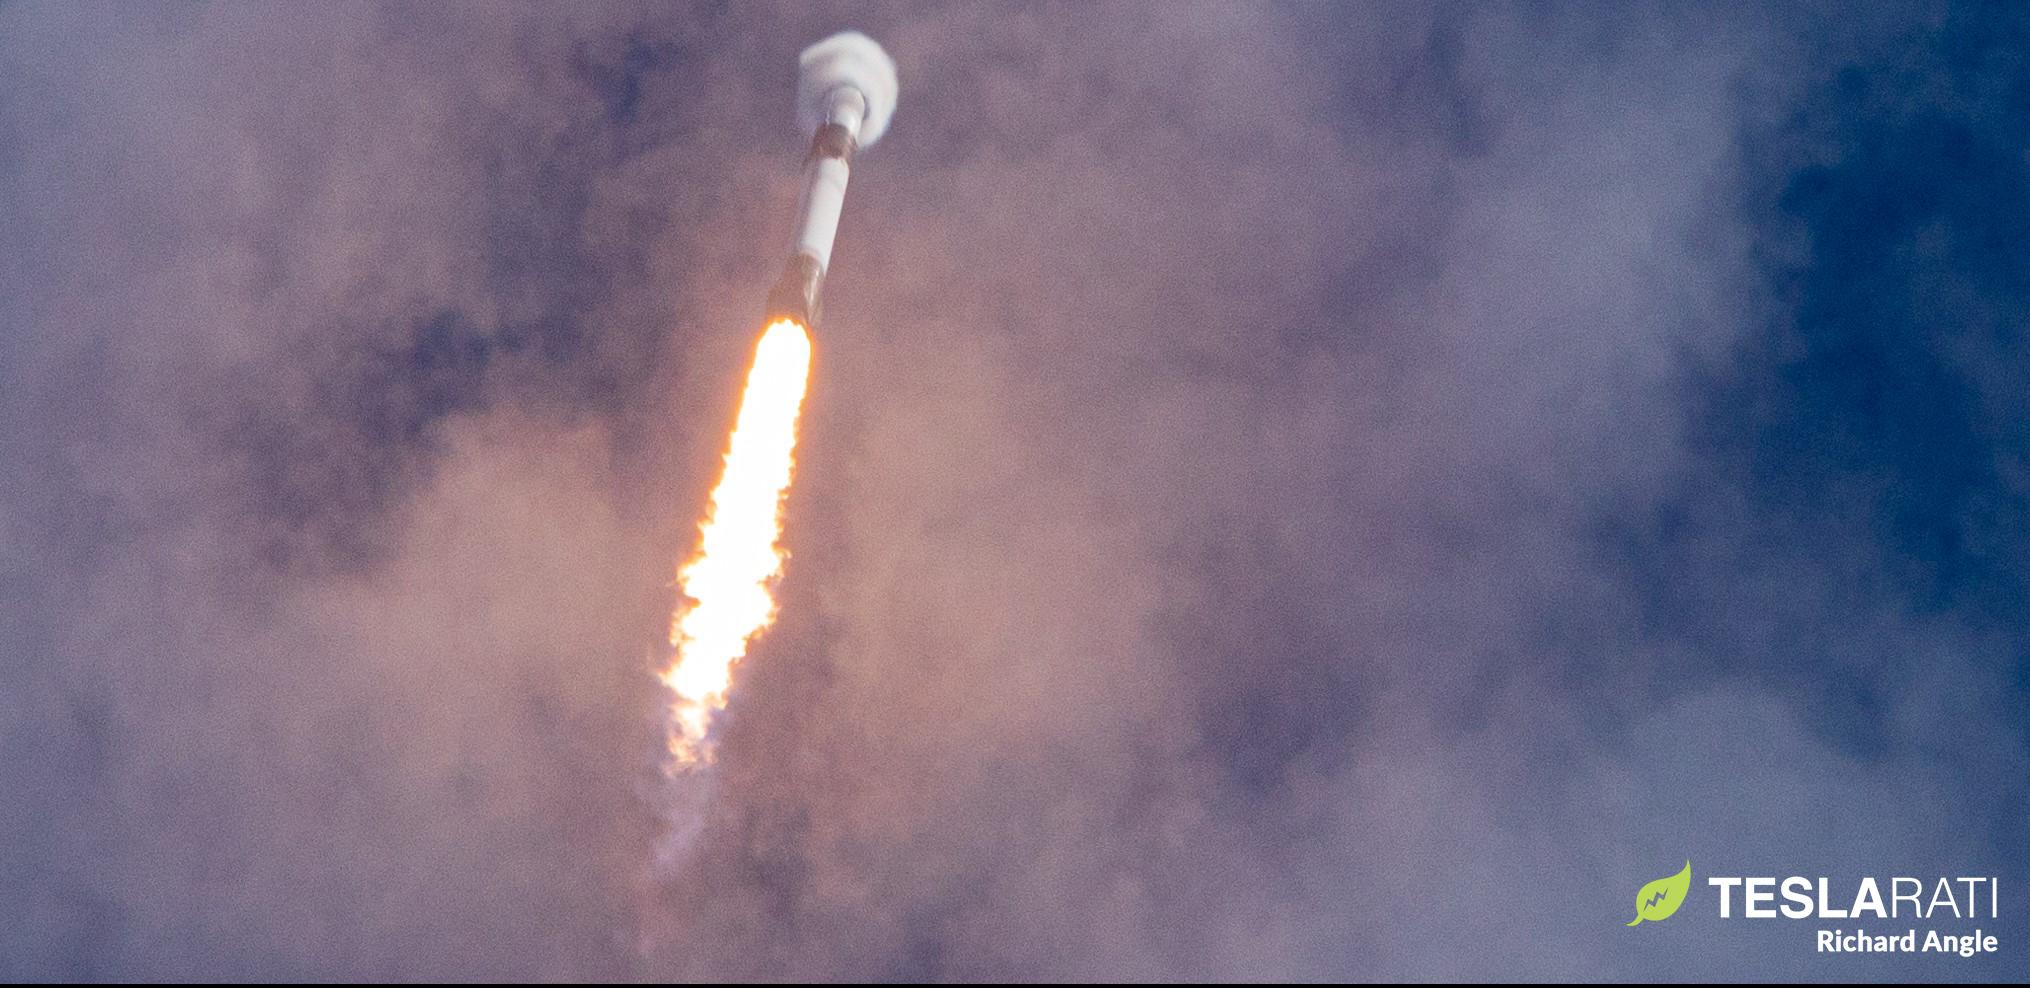 Starlink-10 SkySat Falcon 9 B1049 081820 (Richard Angle) launch 3